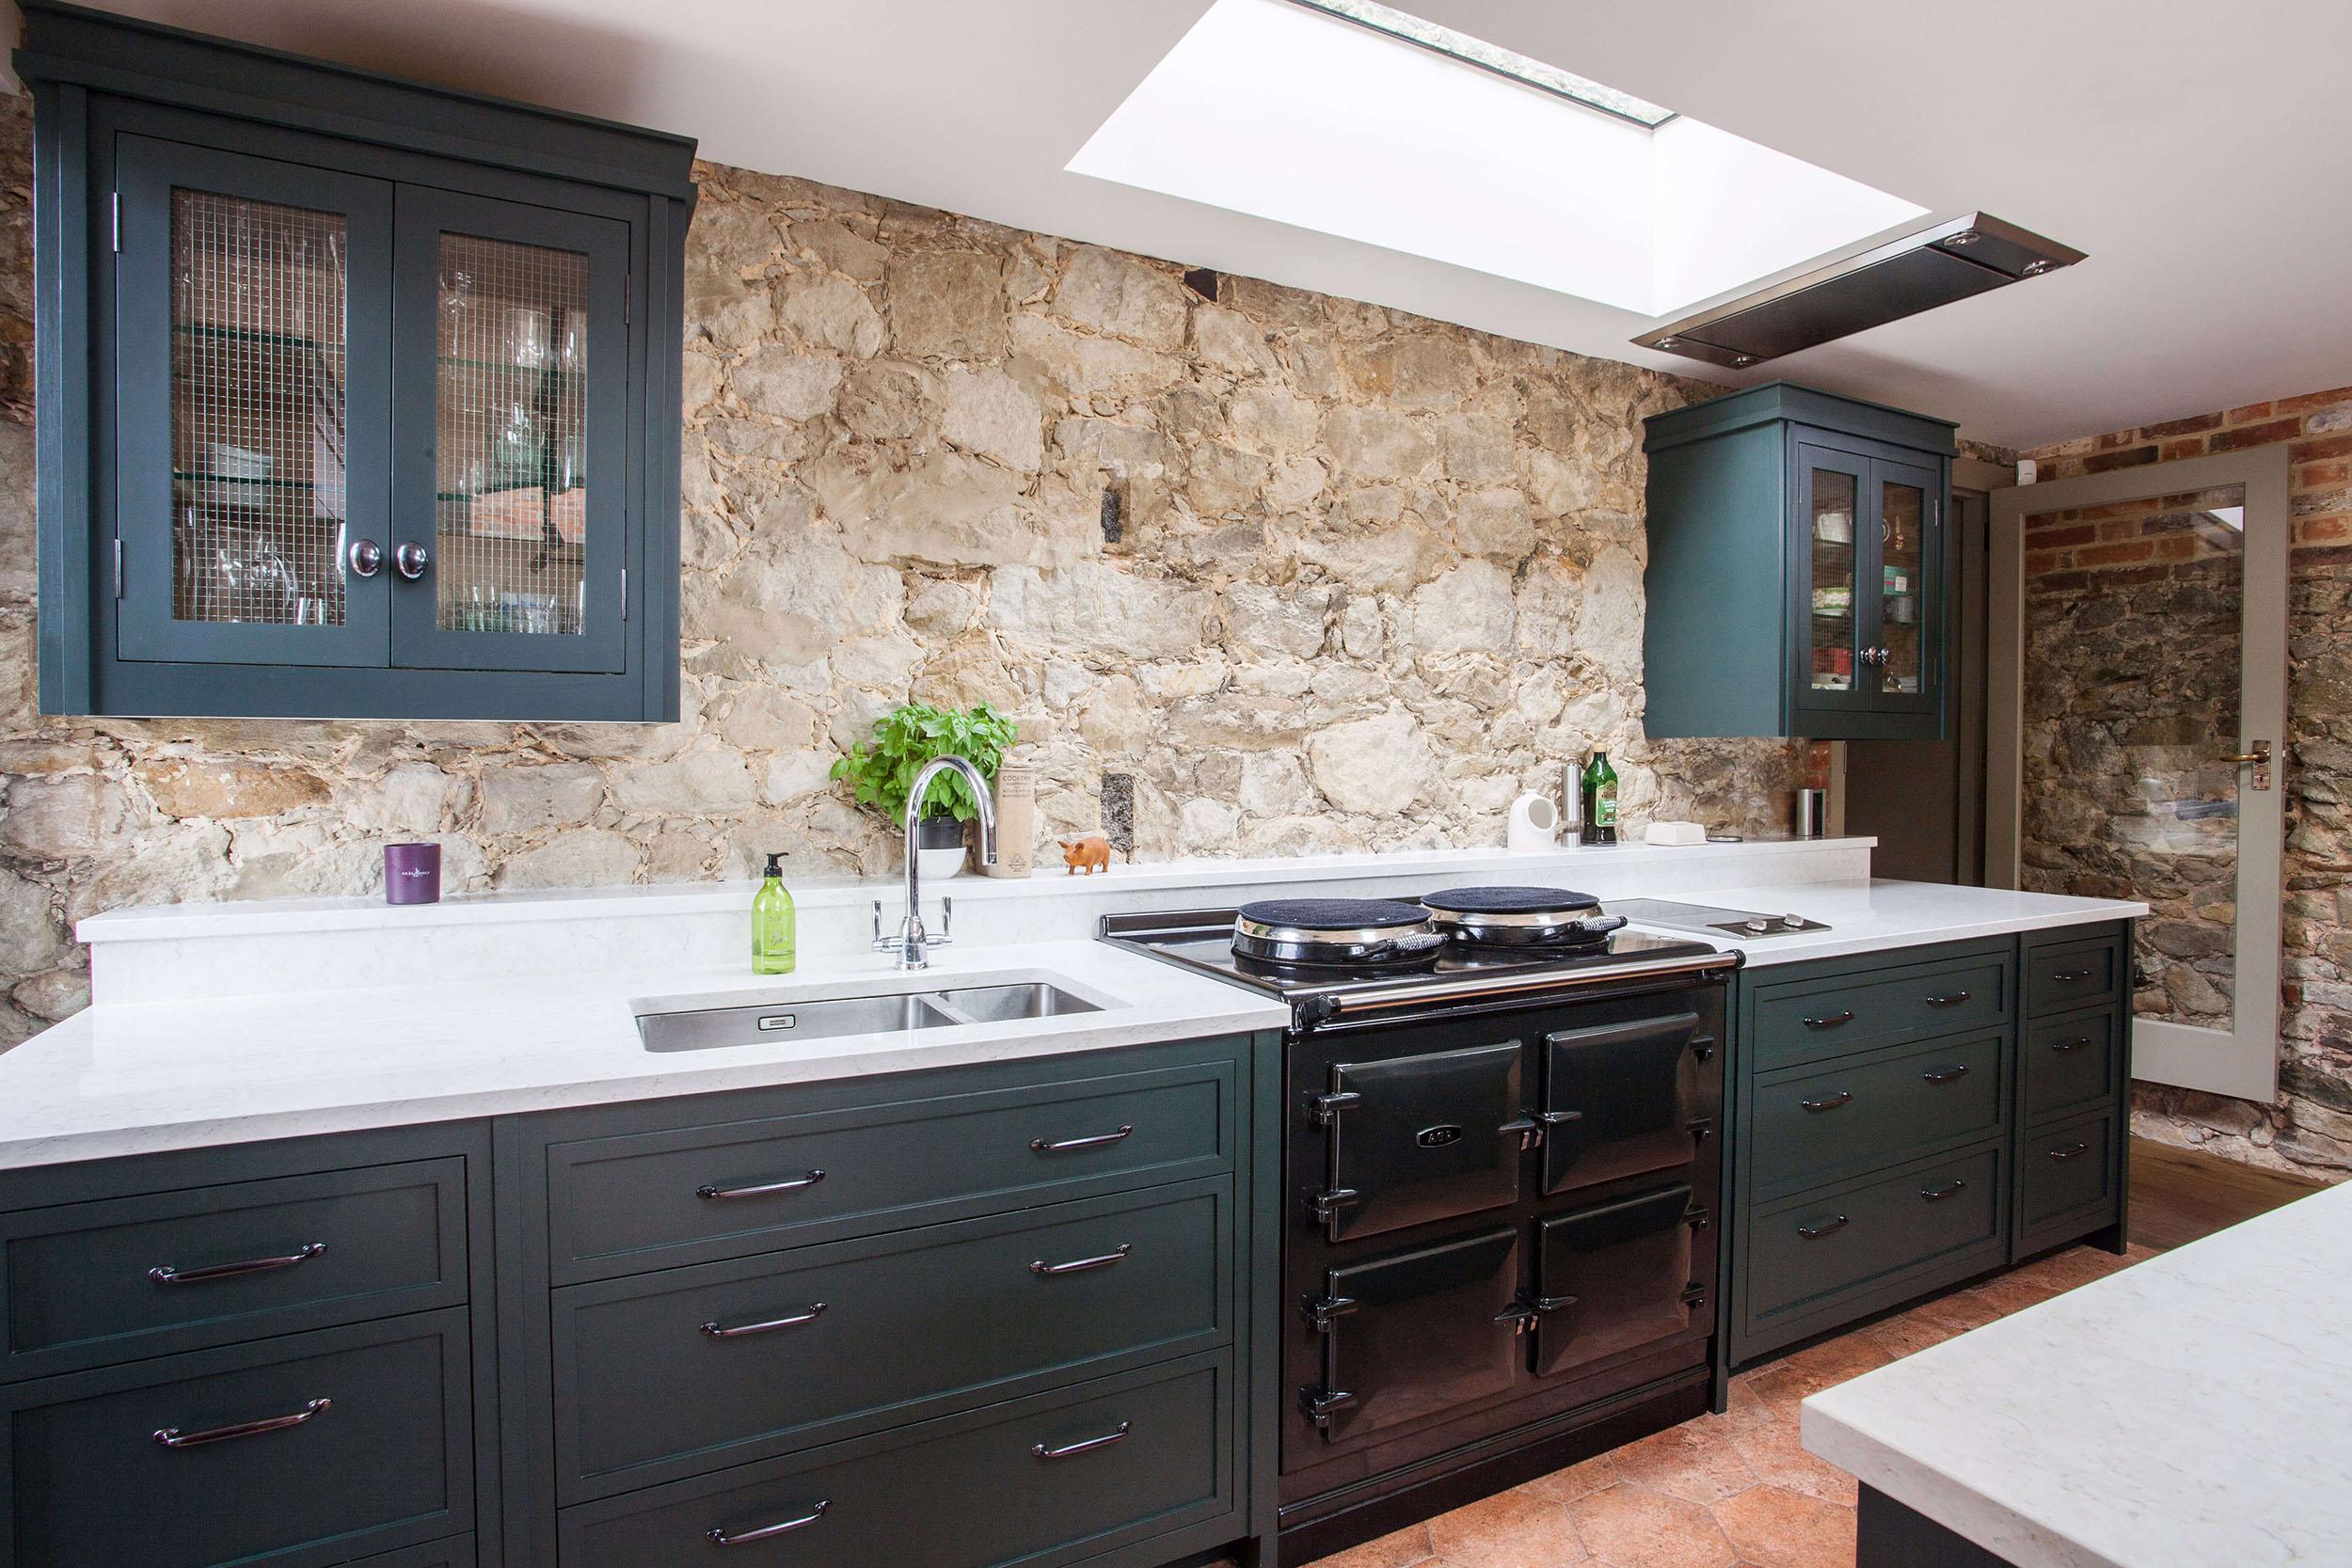 Official Aga Authorised Showroom Handmade Kitchens Burlanes Sevenoaks Kent